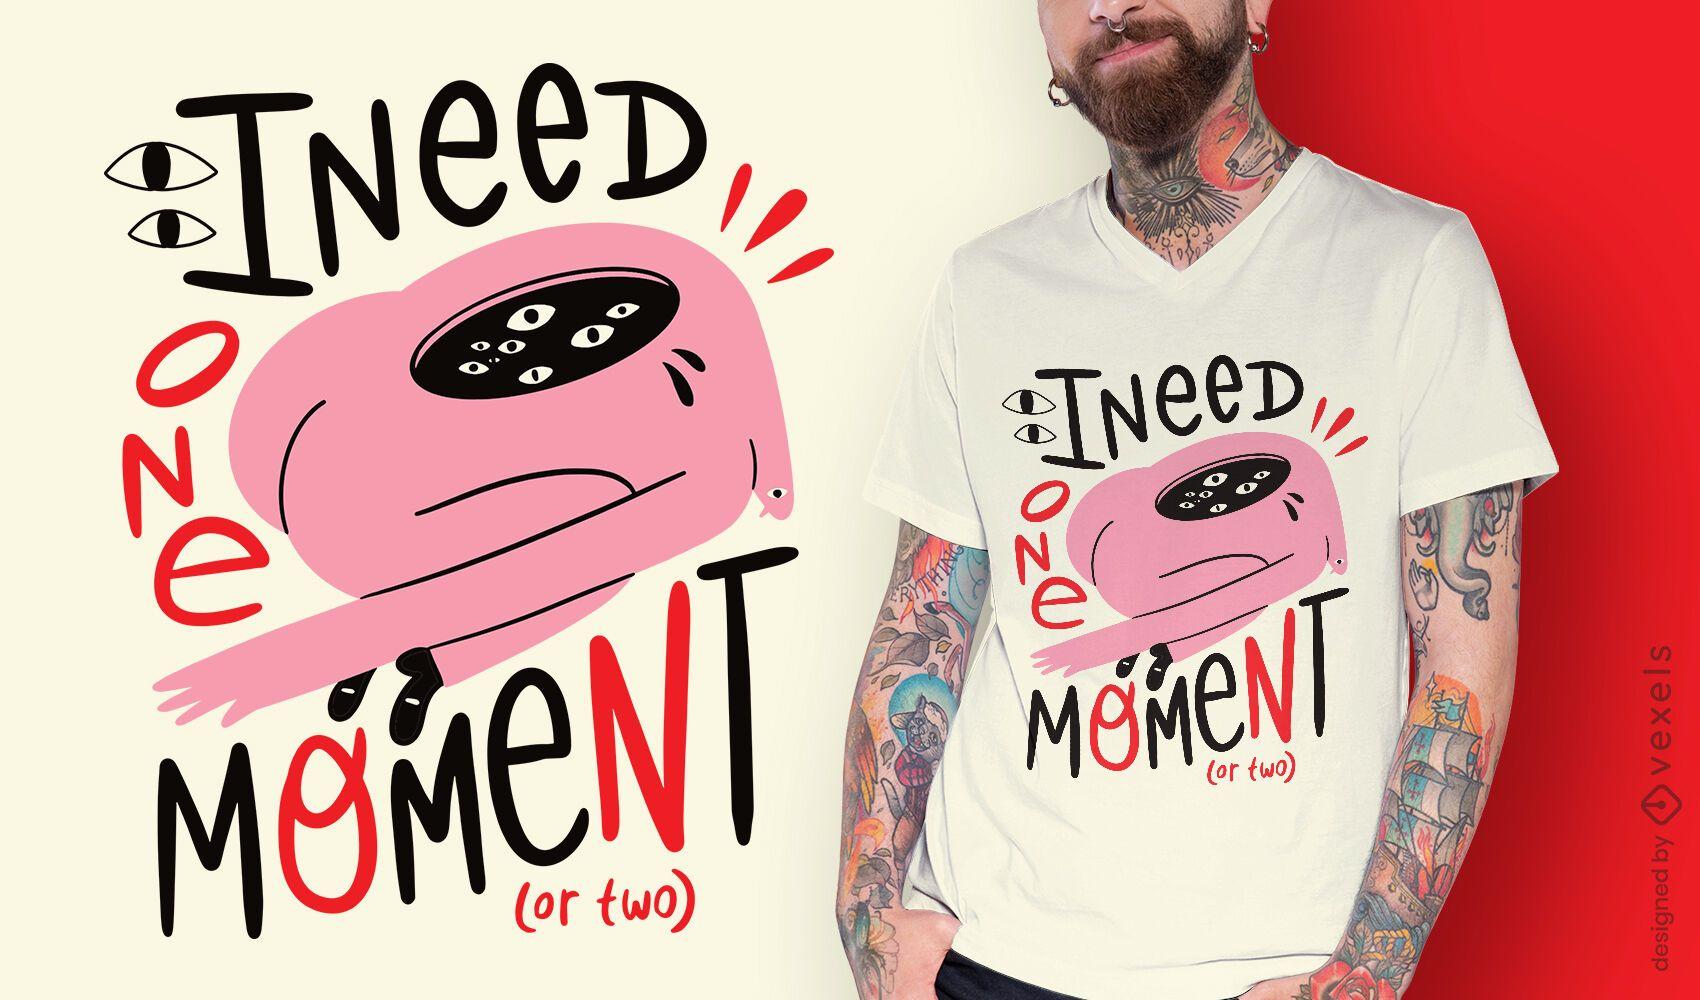 Abstract creature inspiration t-shirt design